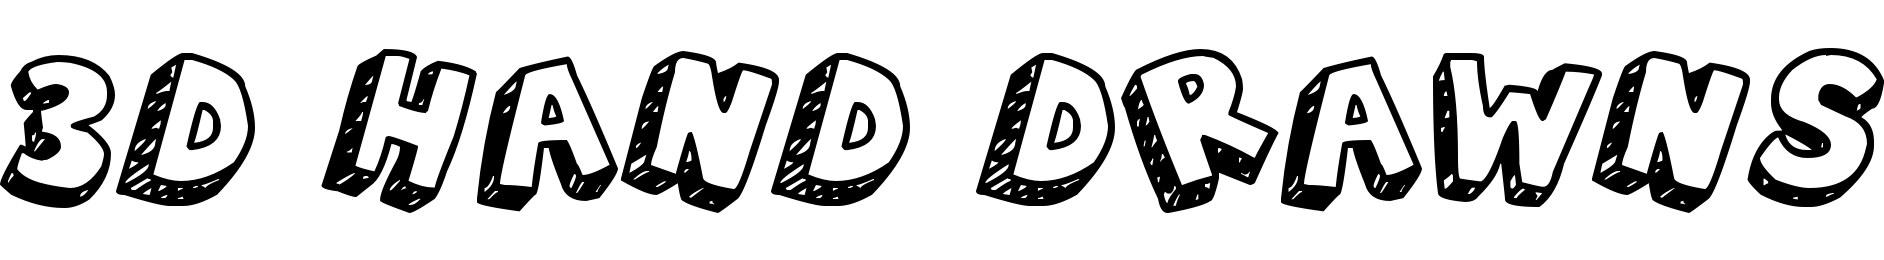 3D Hand Drawns